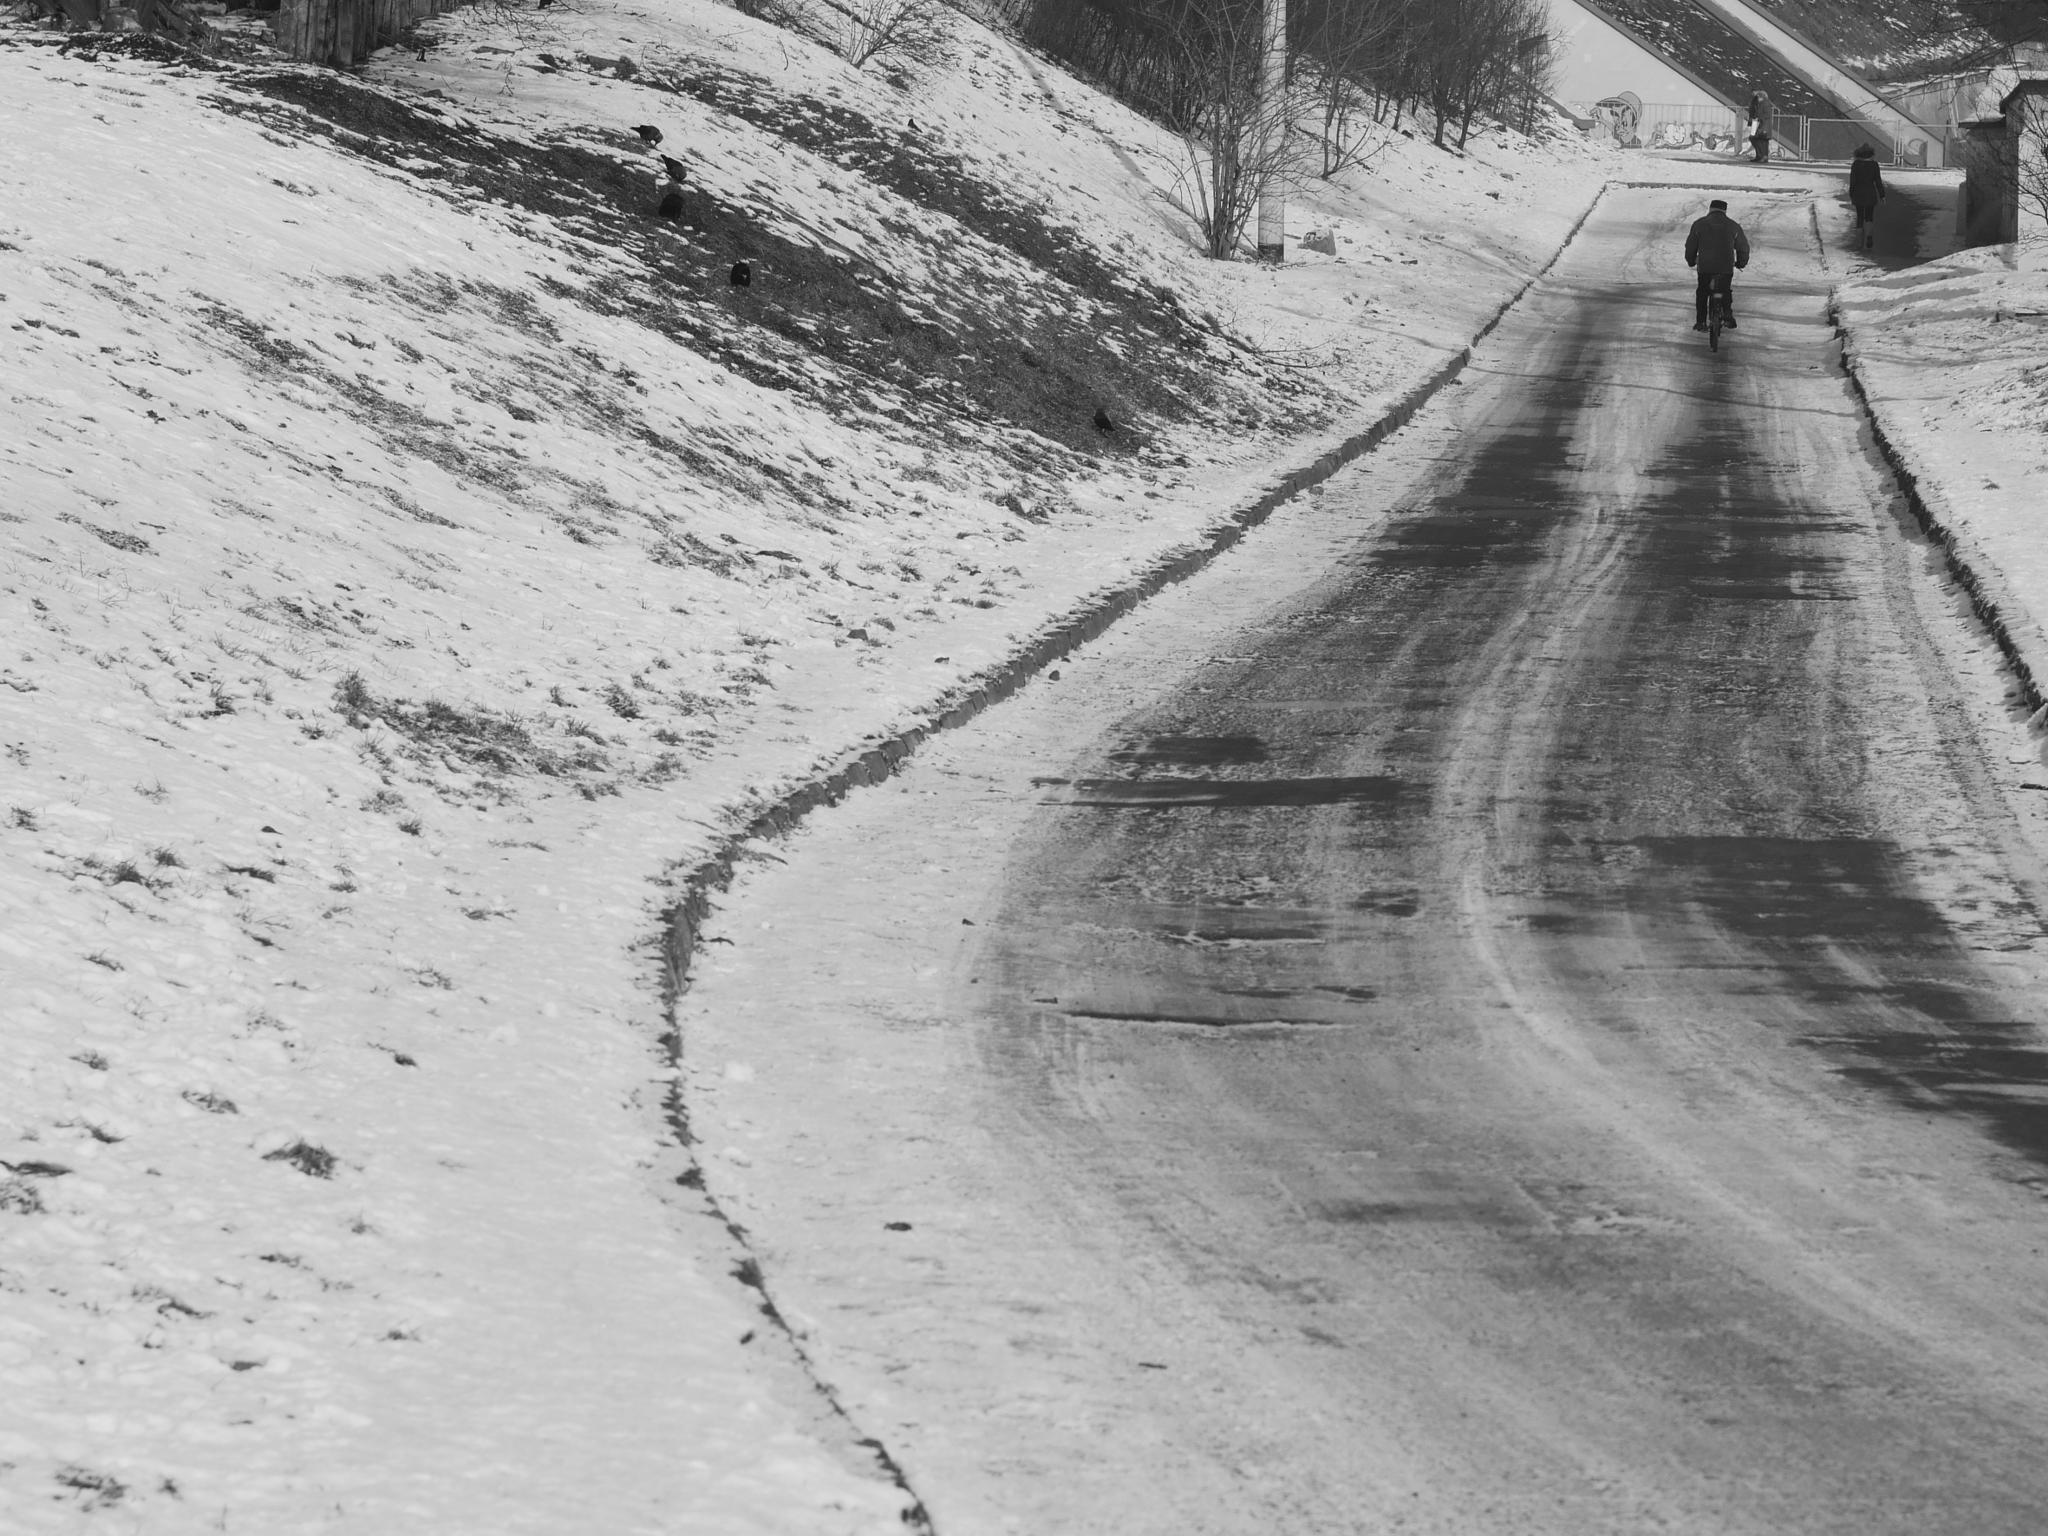 Winter road by skiboarts